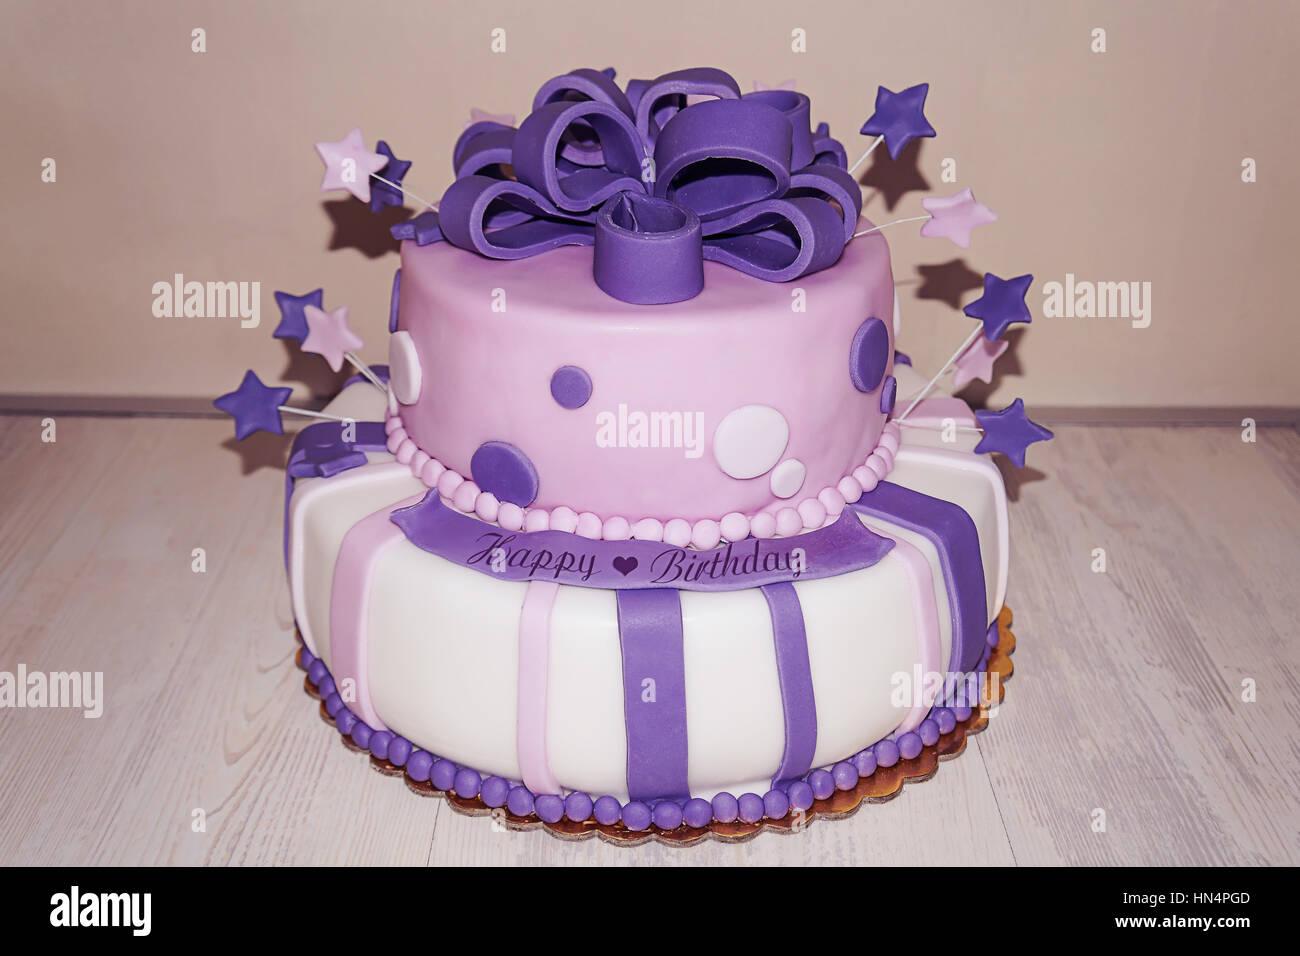 Pink Purple Fondant Birthday Cake Stars And Bow Stock Photo